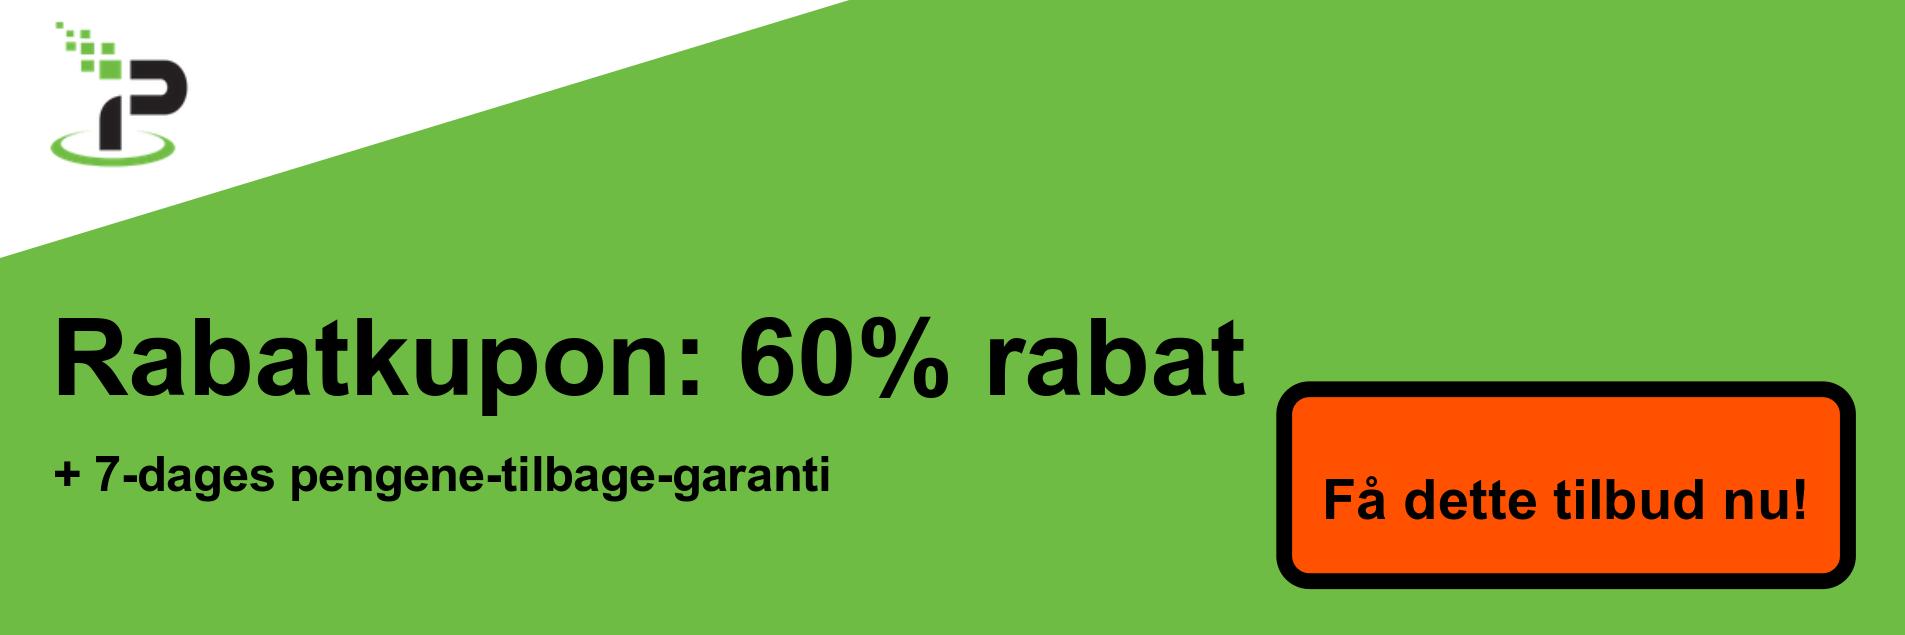 IPVanish kuponbanner - 60% rabat